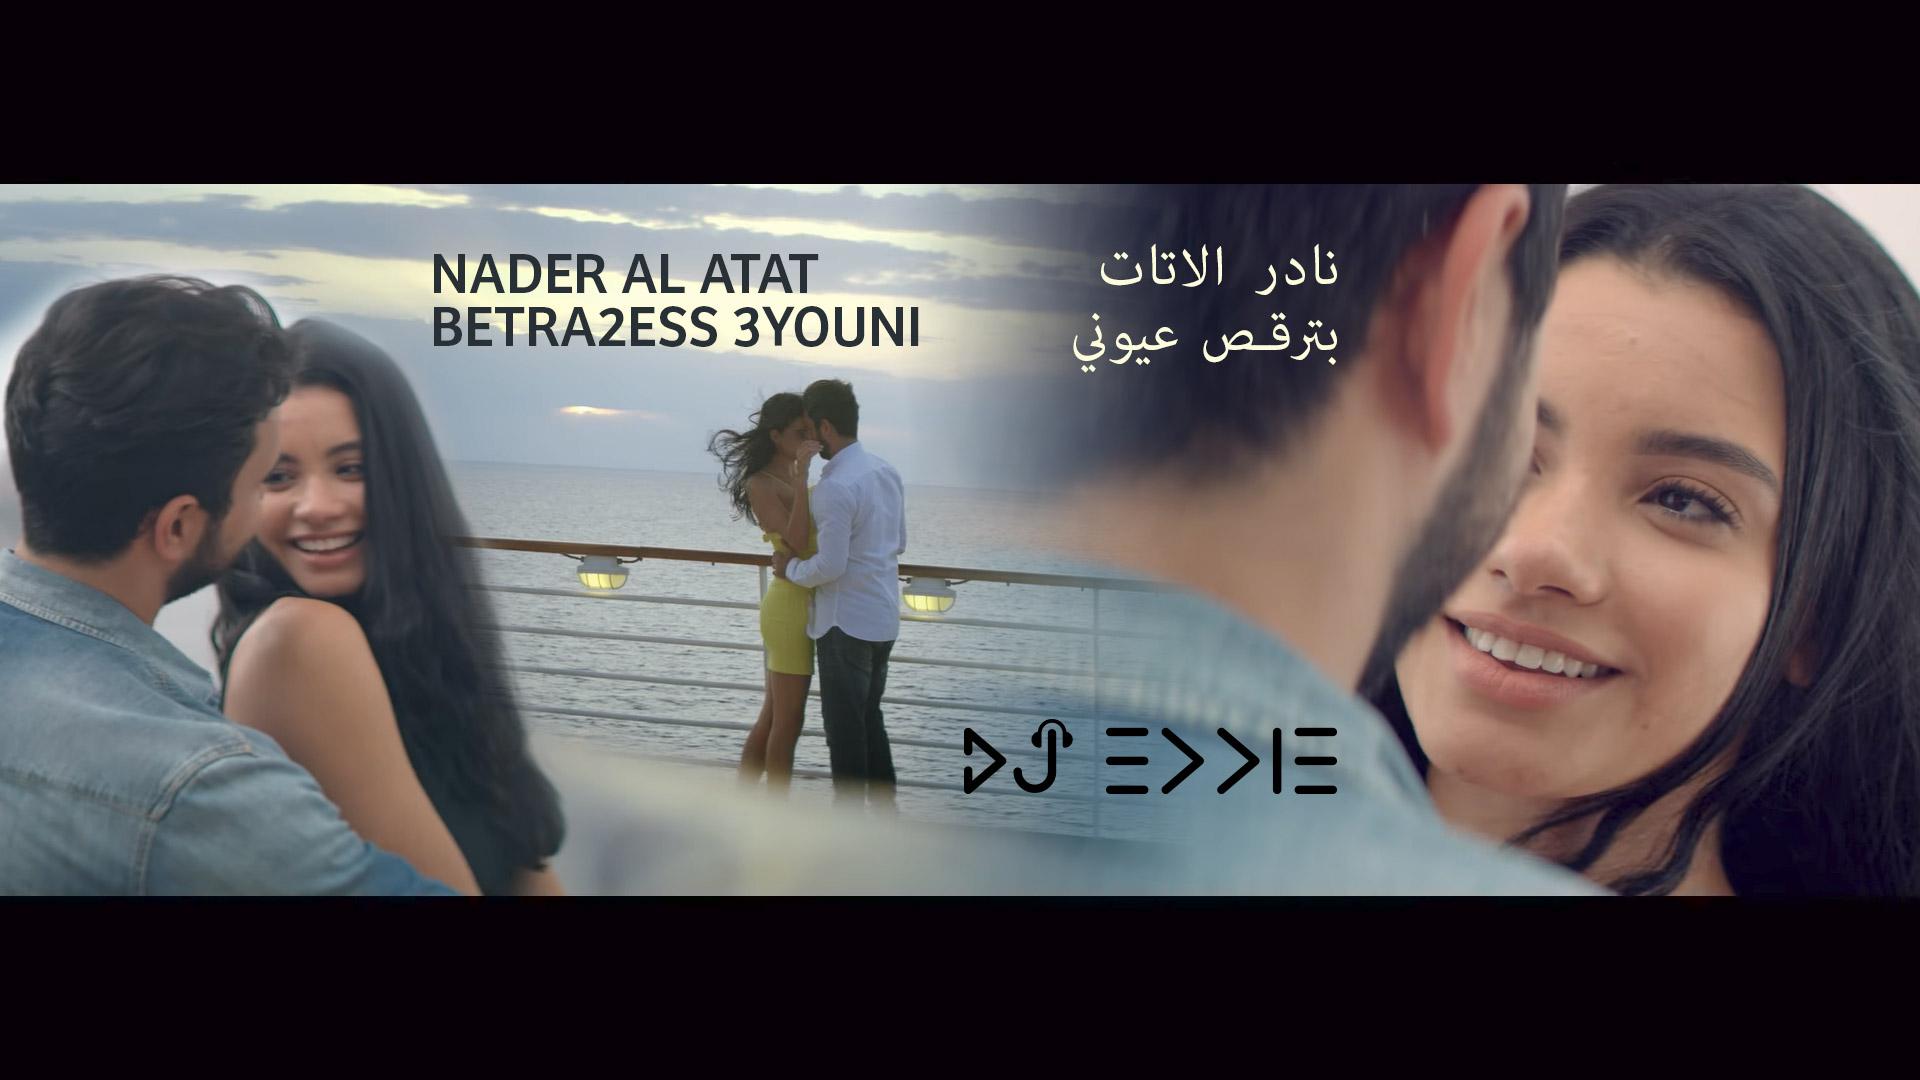 نادر الاتات - بترقص عيوني Nader Al Atat - Betra2ess 3youni